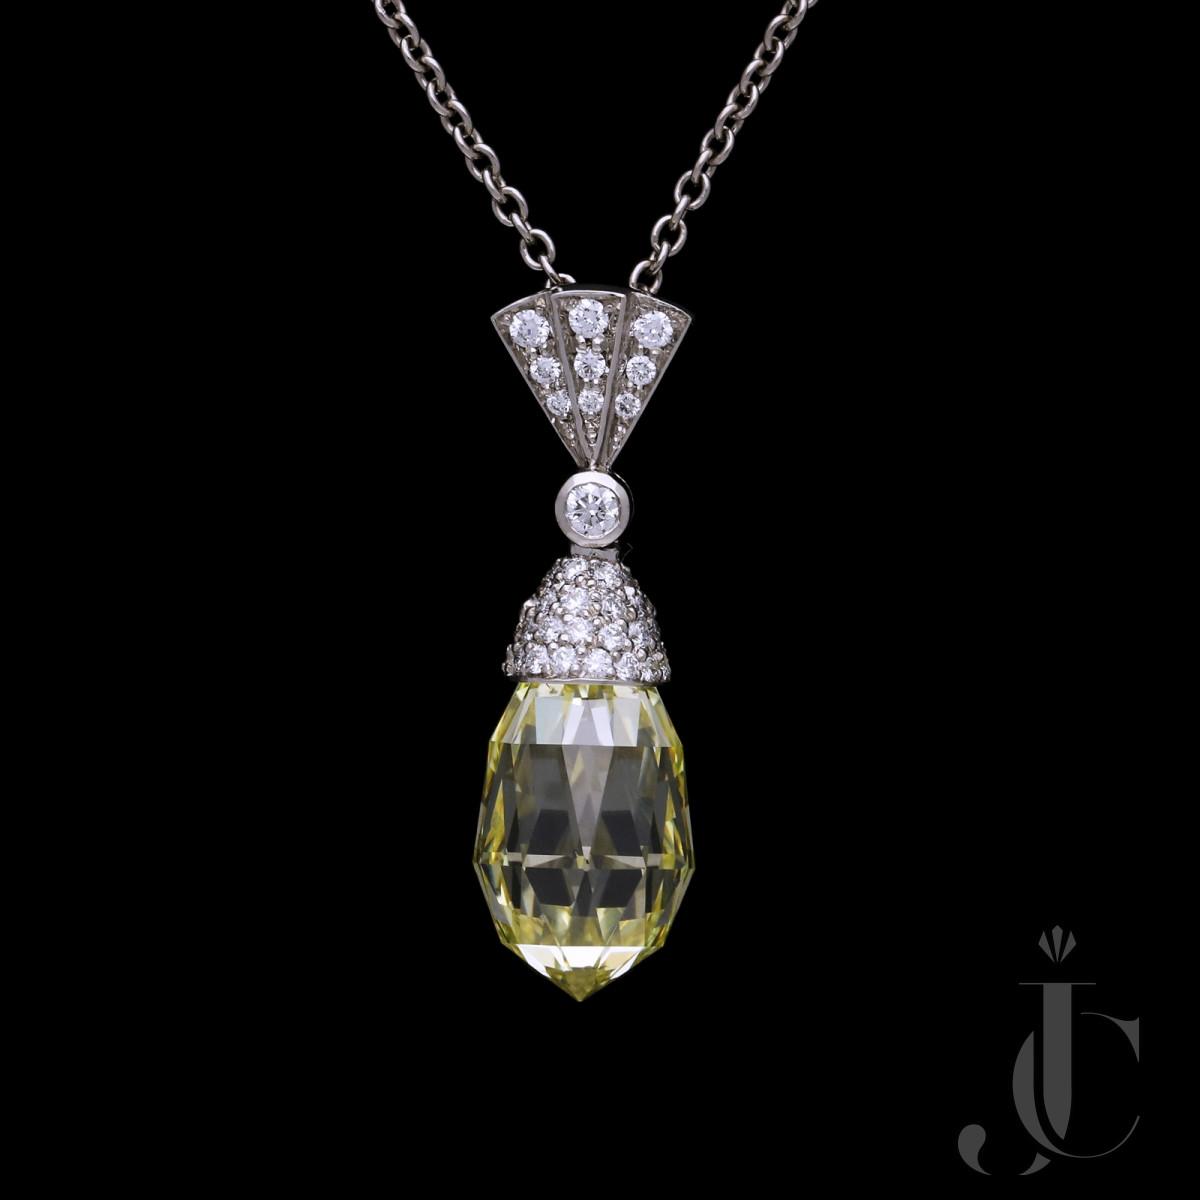 4.50ct Fancy Yellow Briolette Diamond